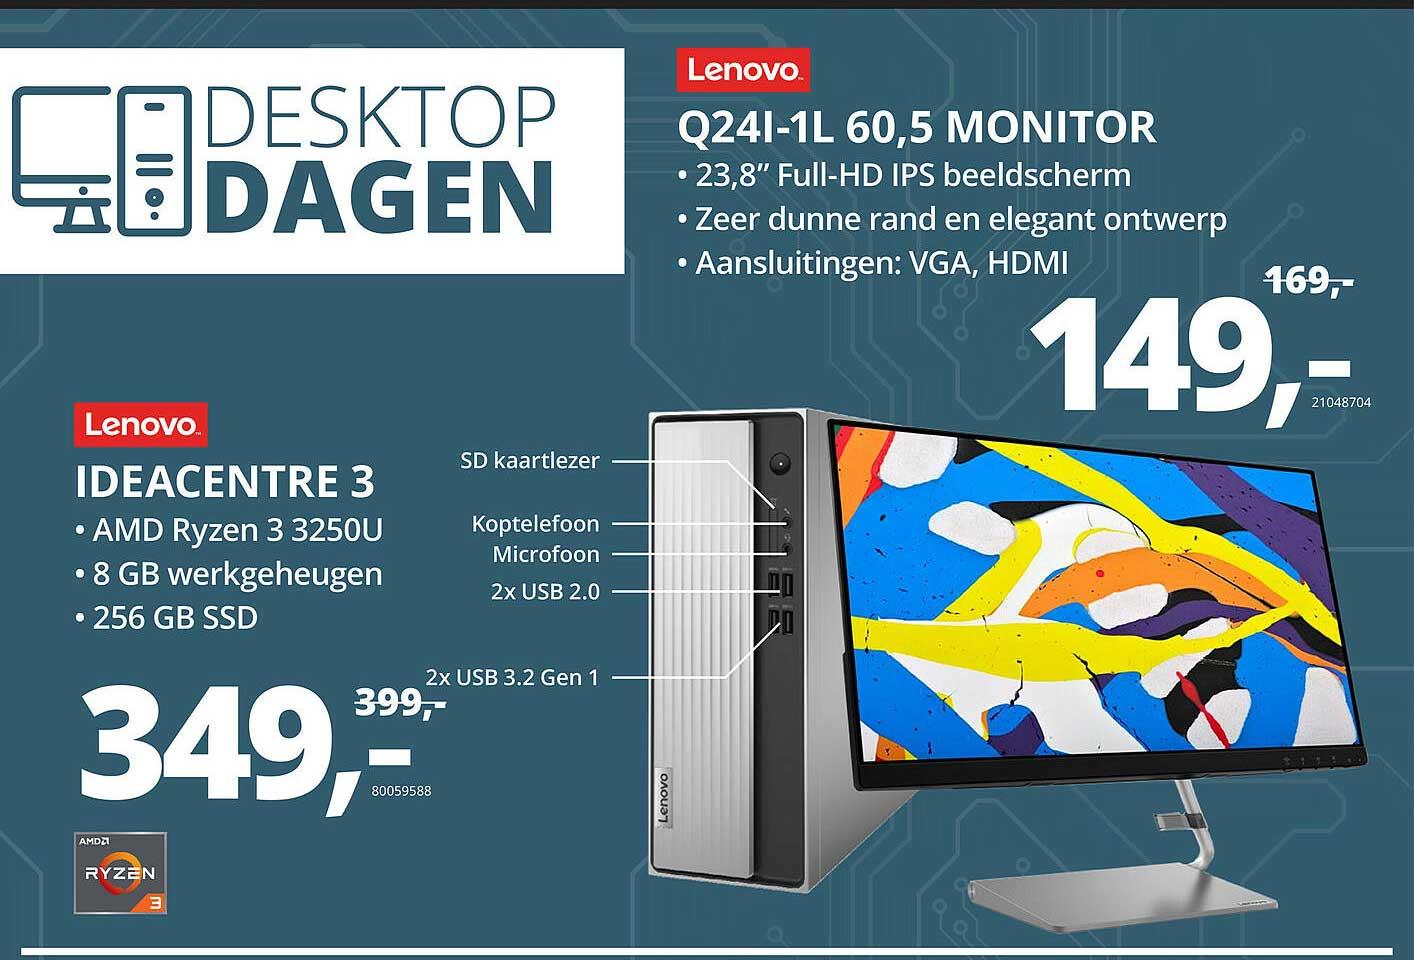 Paradigit Lenovo Ideacentre 3 Of Lenovo Q24I-1L 60,5 Monitor